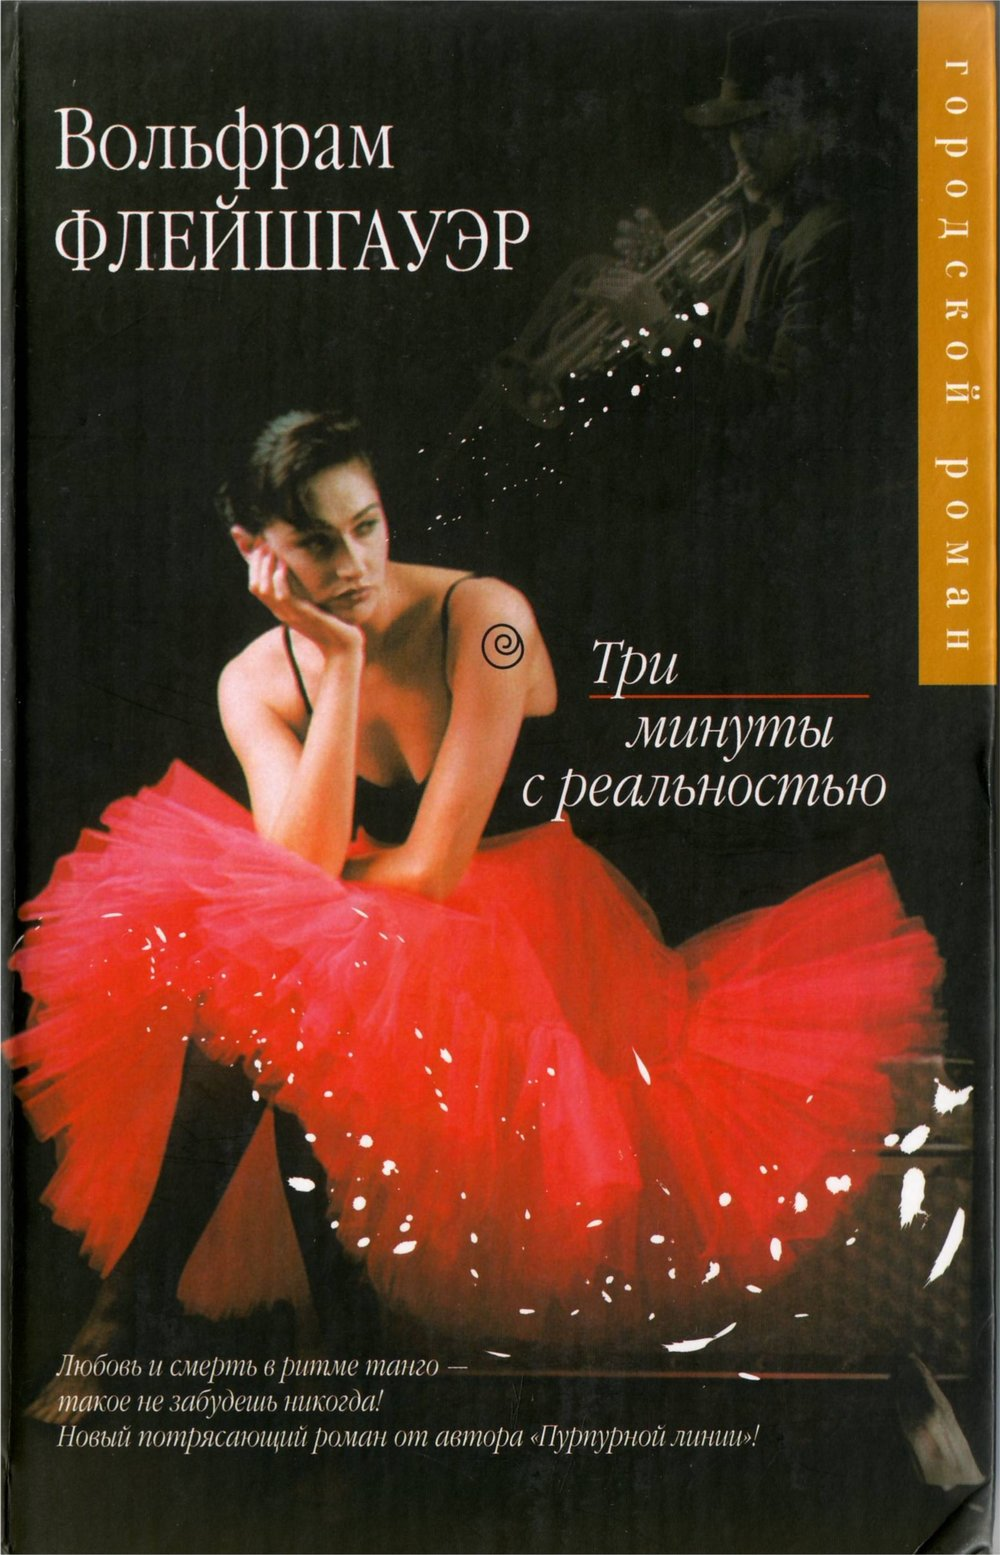 Tango Russland Originalausgabe.jpg